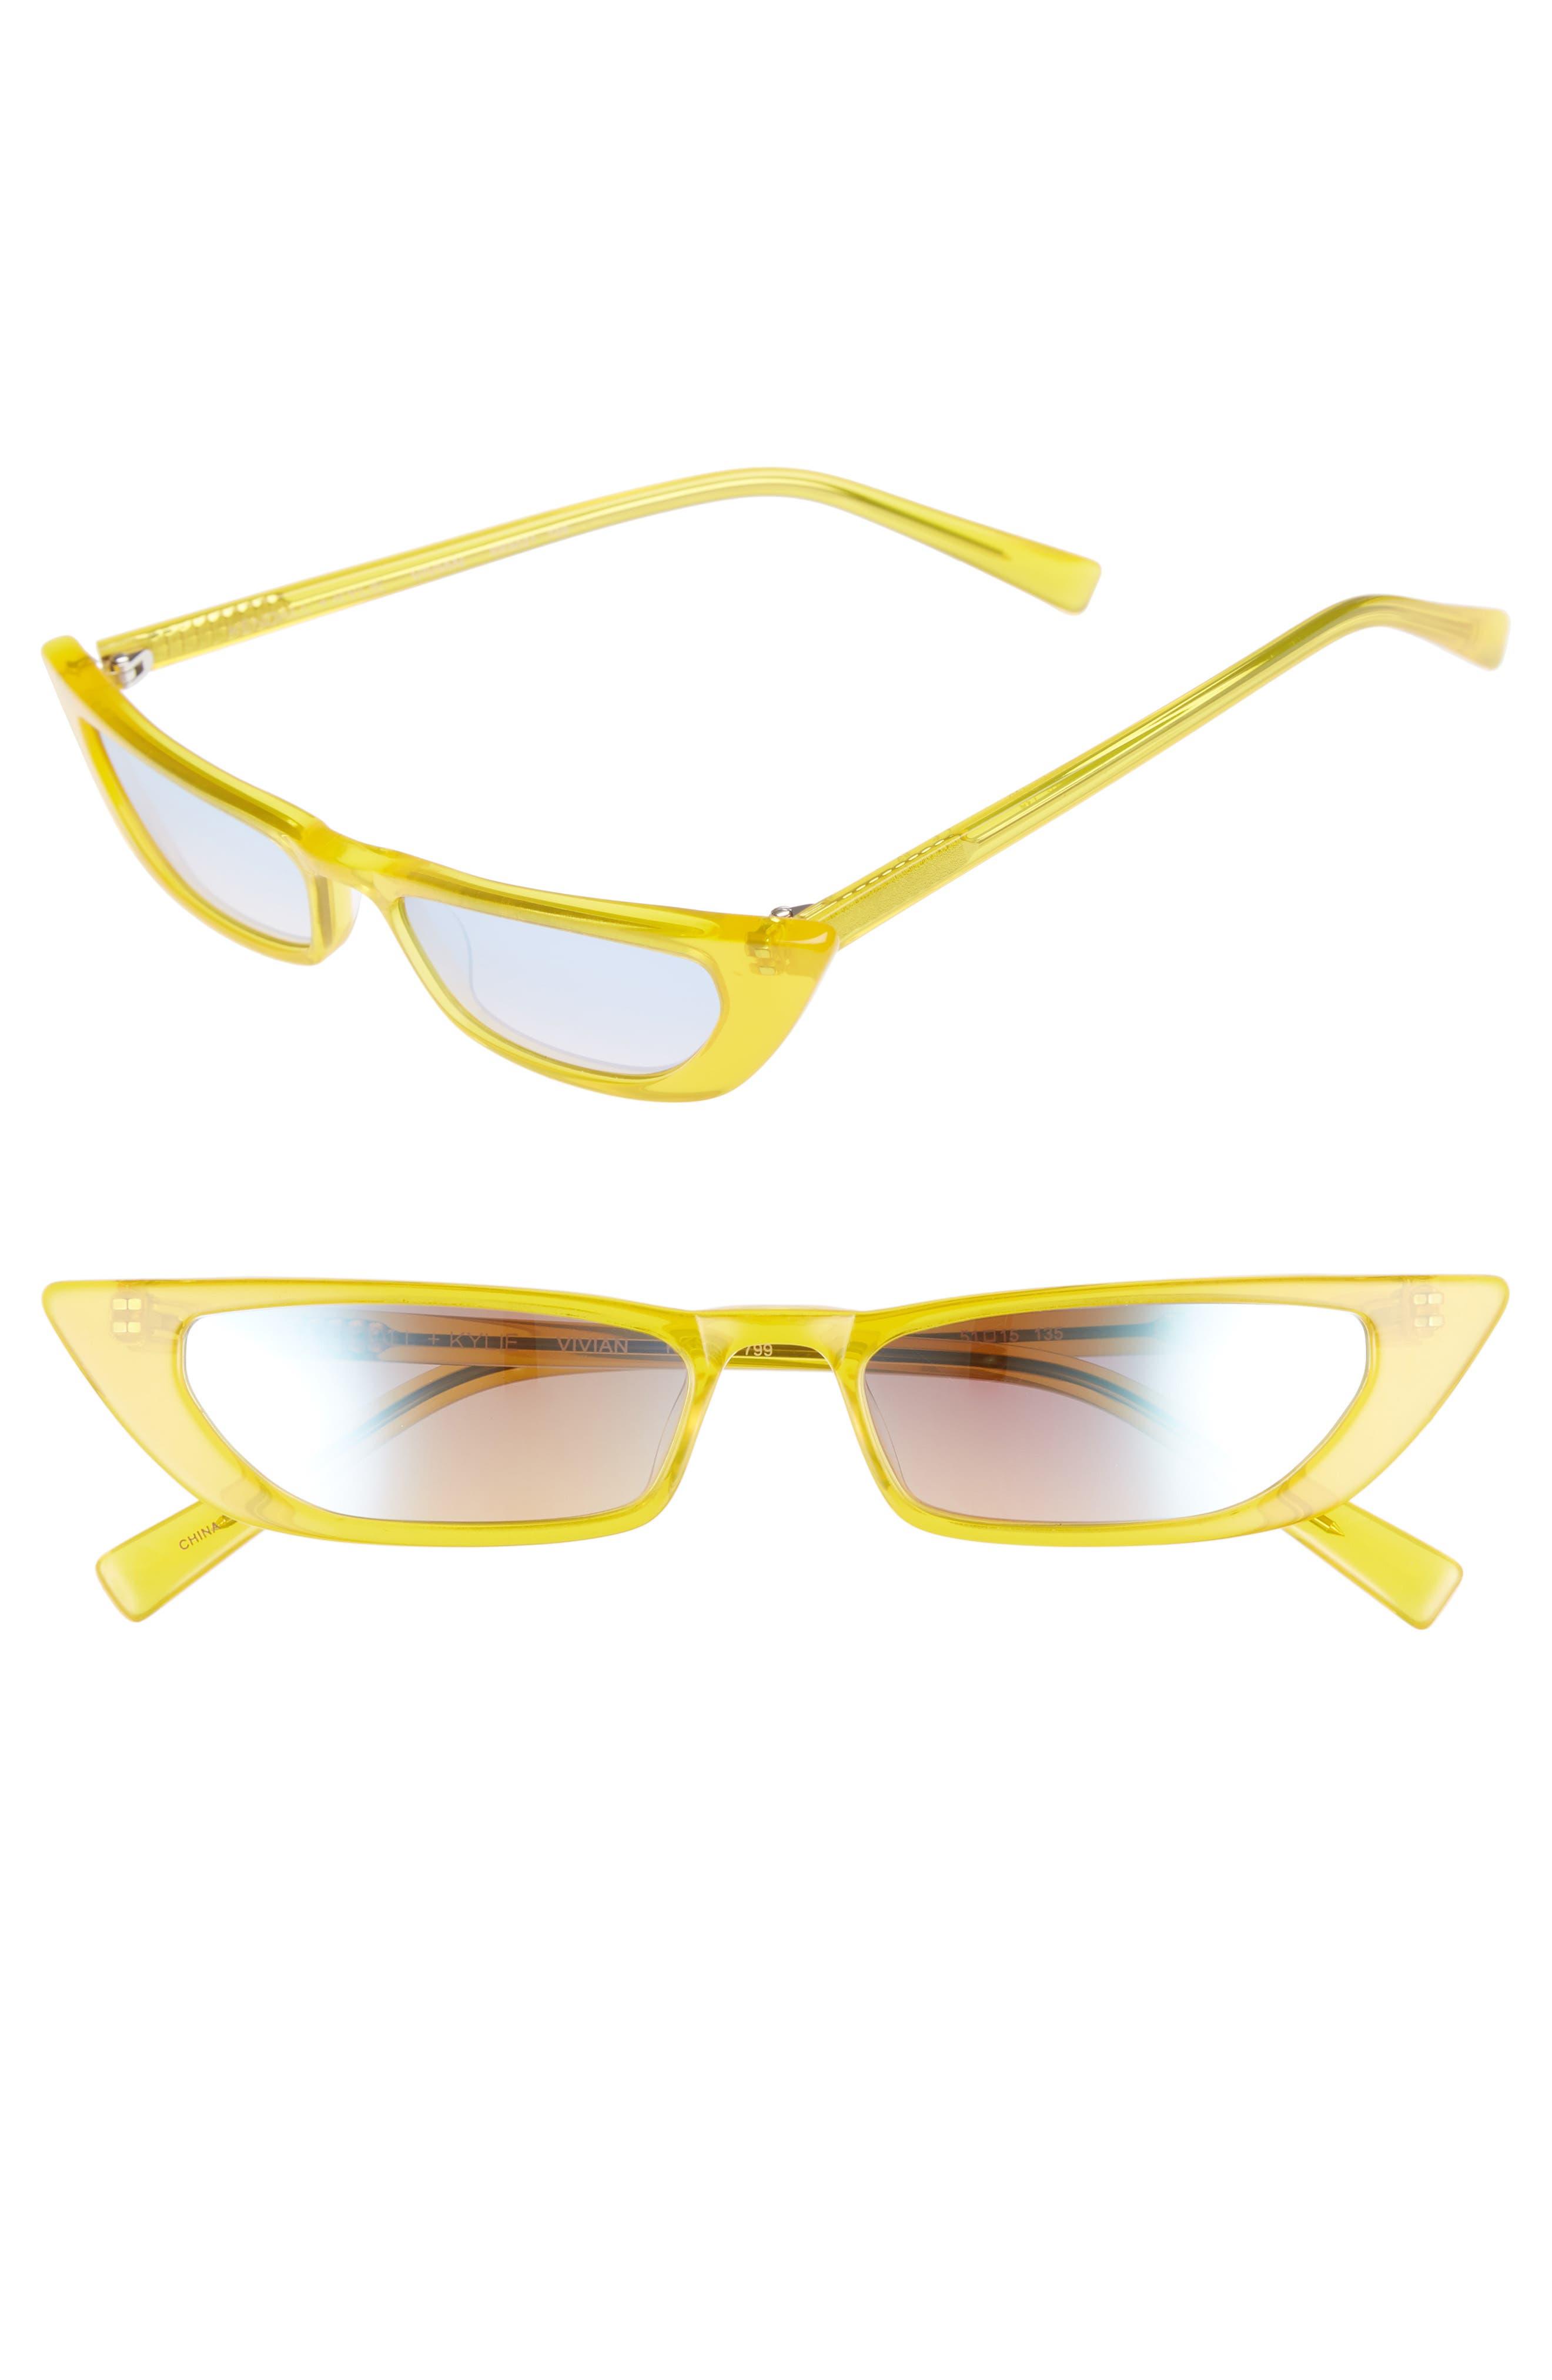 Vivian Extreme 51mm Cat Eye Sunglasses,                             Main thumbnail 1, color,                             SUN CITY YELLOW/ SOLID SMOKE